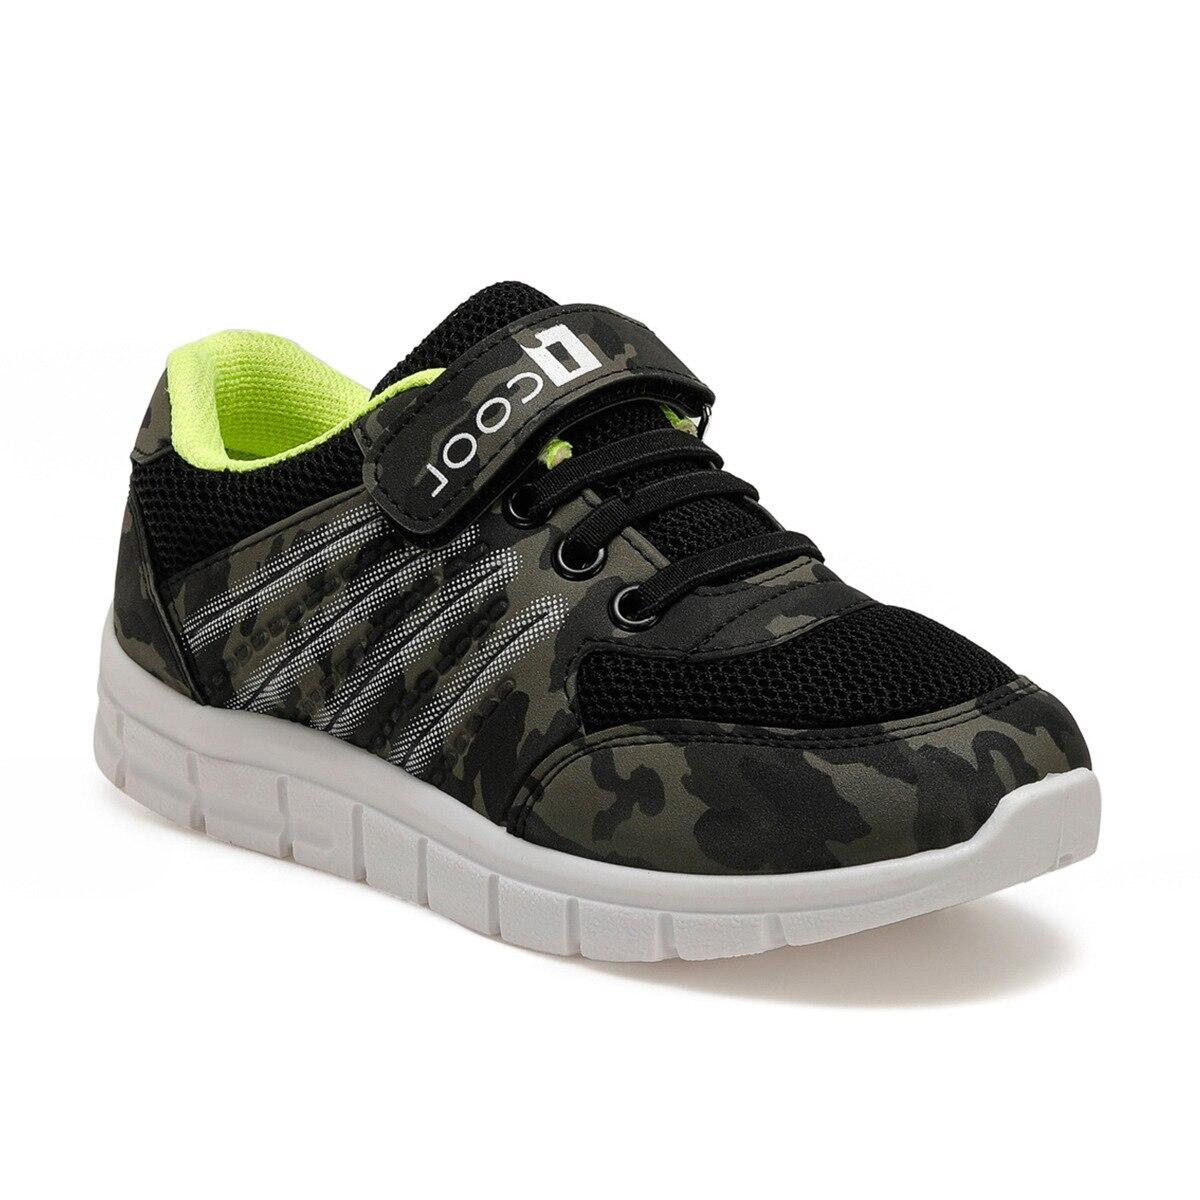 FLO MBAPPE Khaki Male Child Hiking Shoes I-Cool